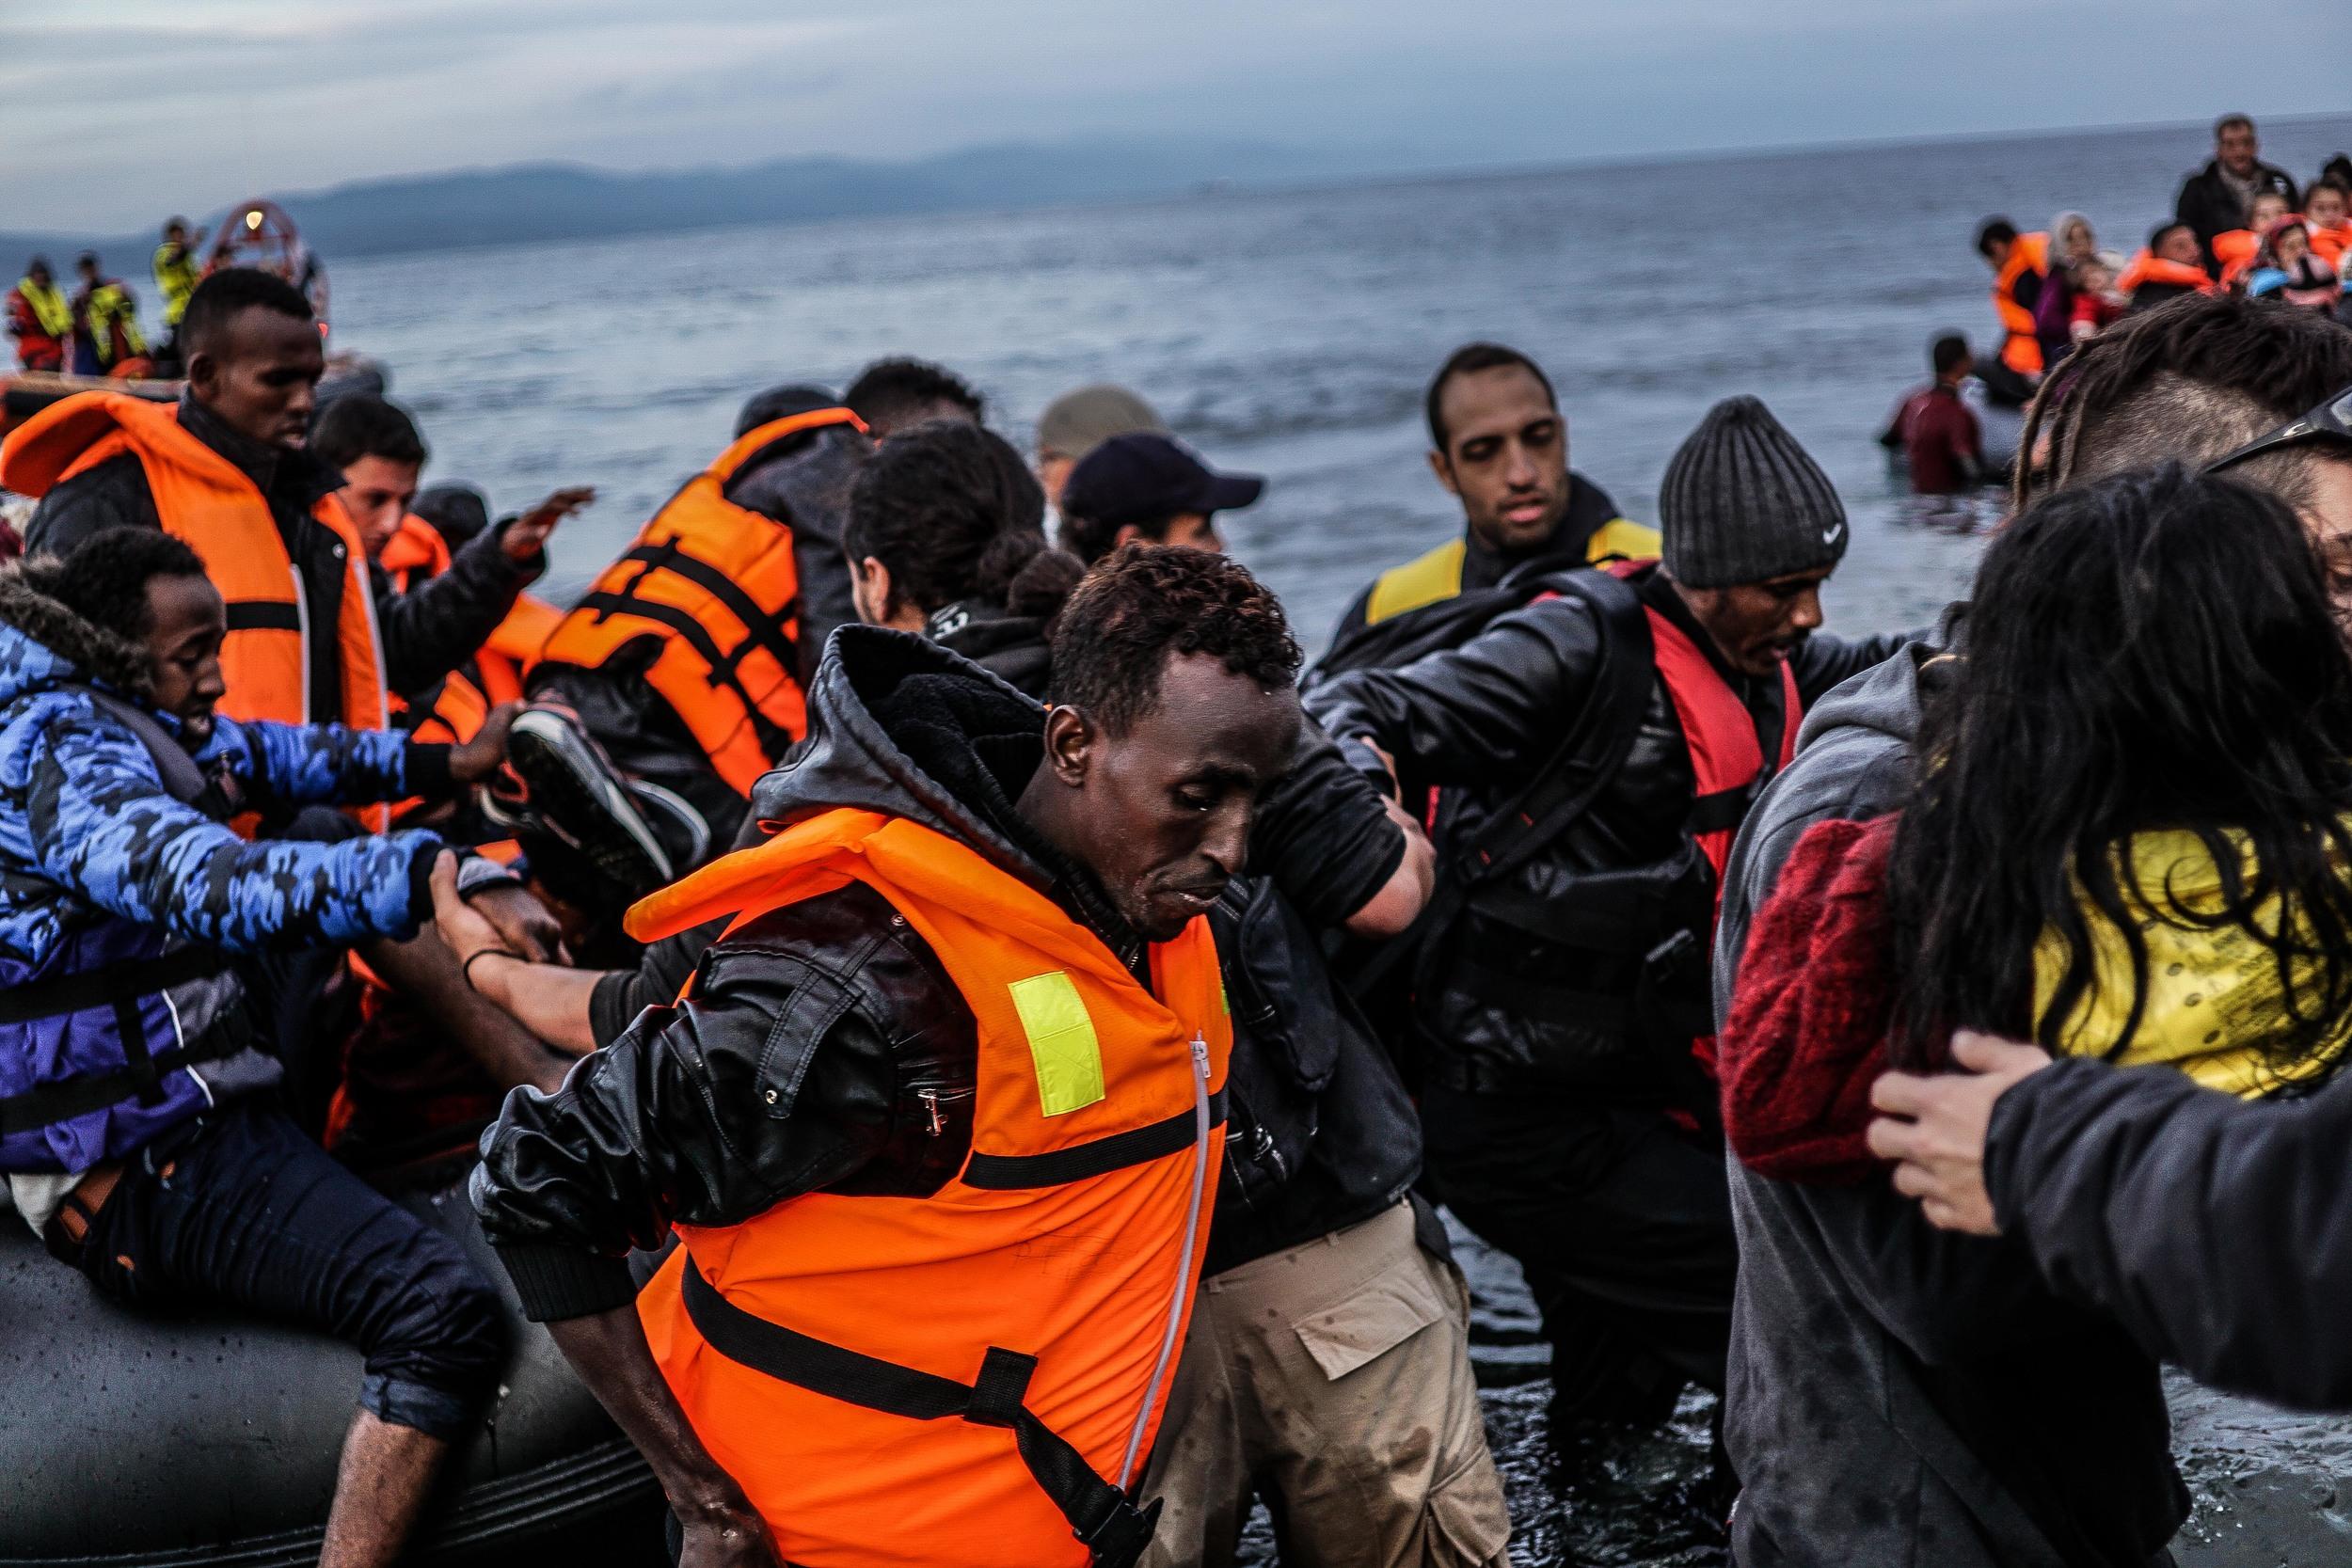 Syrian Refugee Crisis Lesbos Greece November 2015 9.jpg